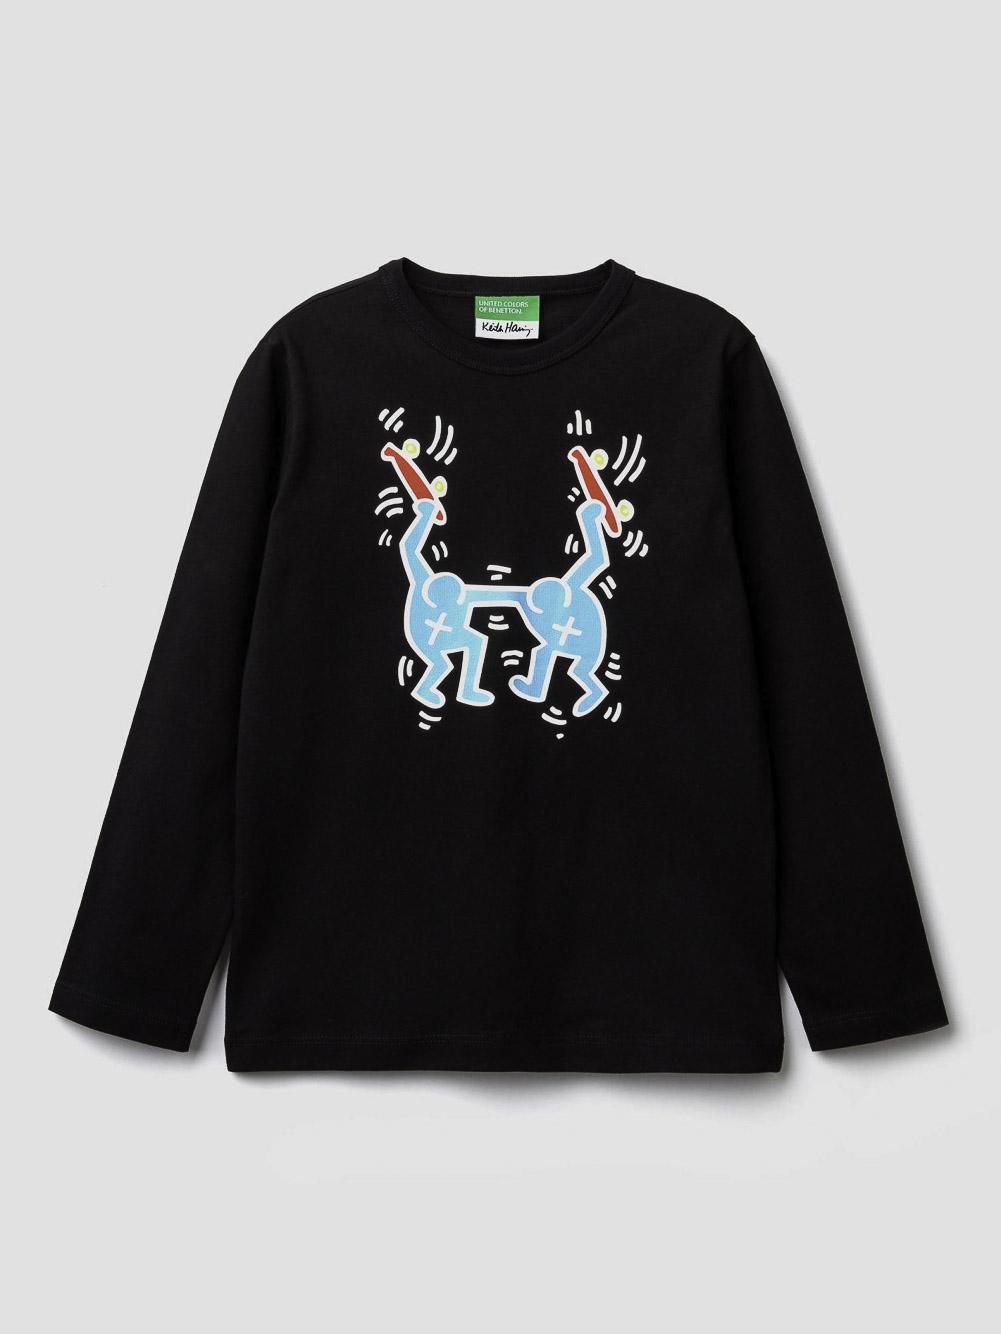 012 BENETTON T-shirt Keith Haring 3096C14U2 20A100